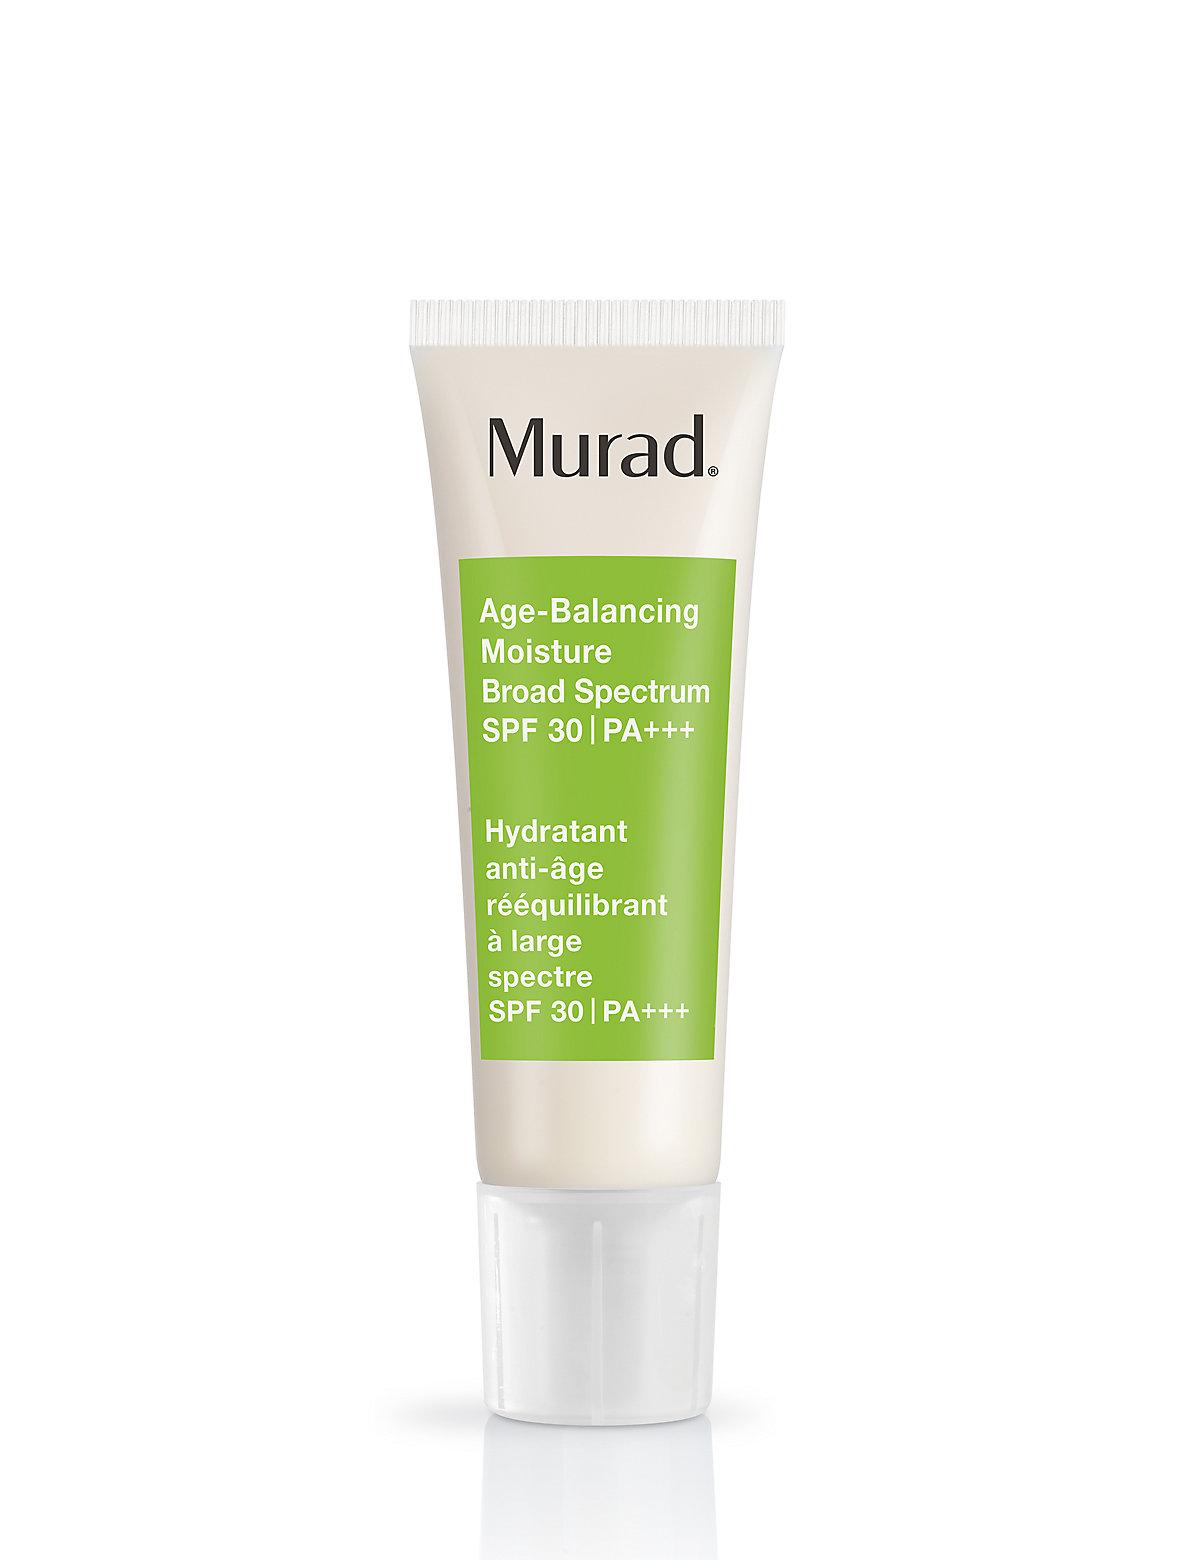 Murad Age-Balancing Moisture Broad Spectrum SPF30 PA+++ 50ml